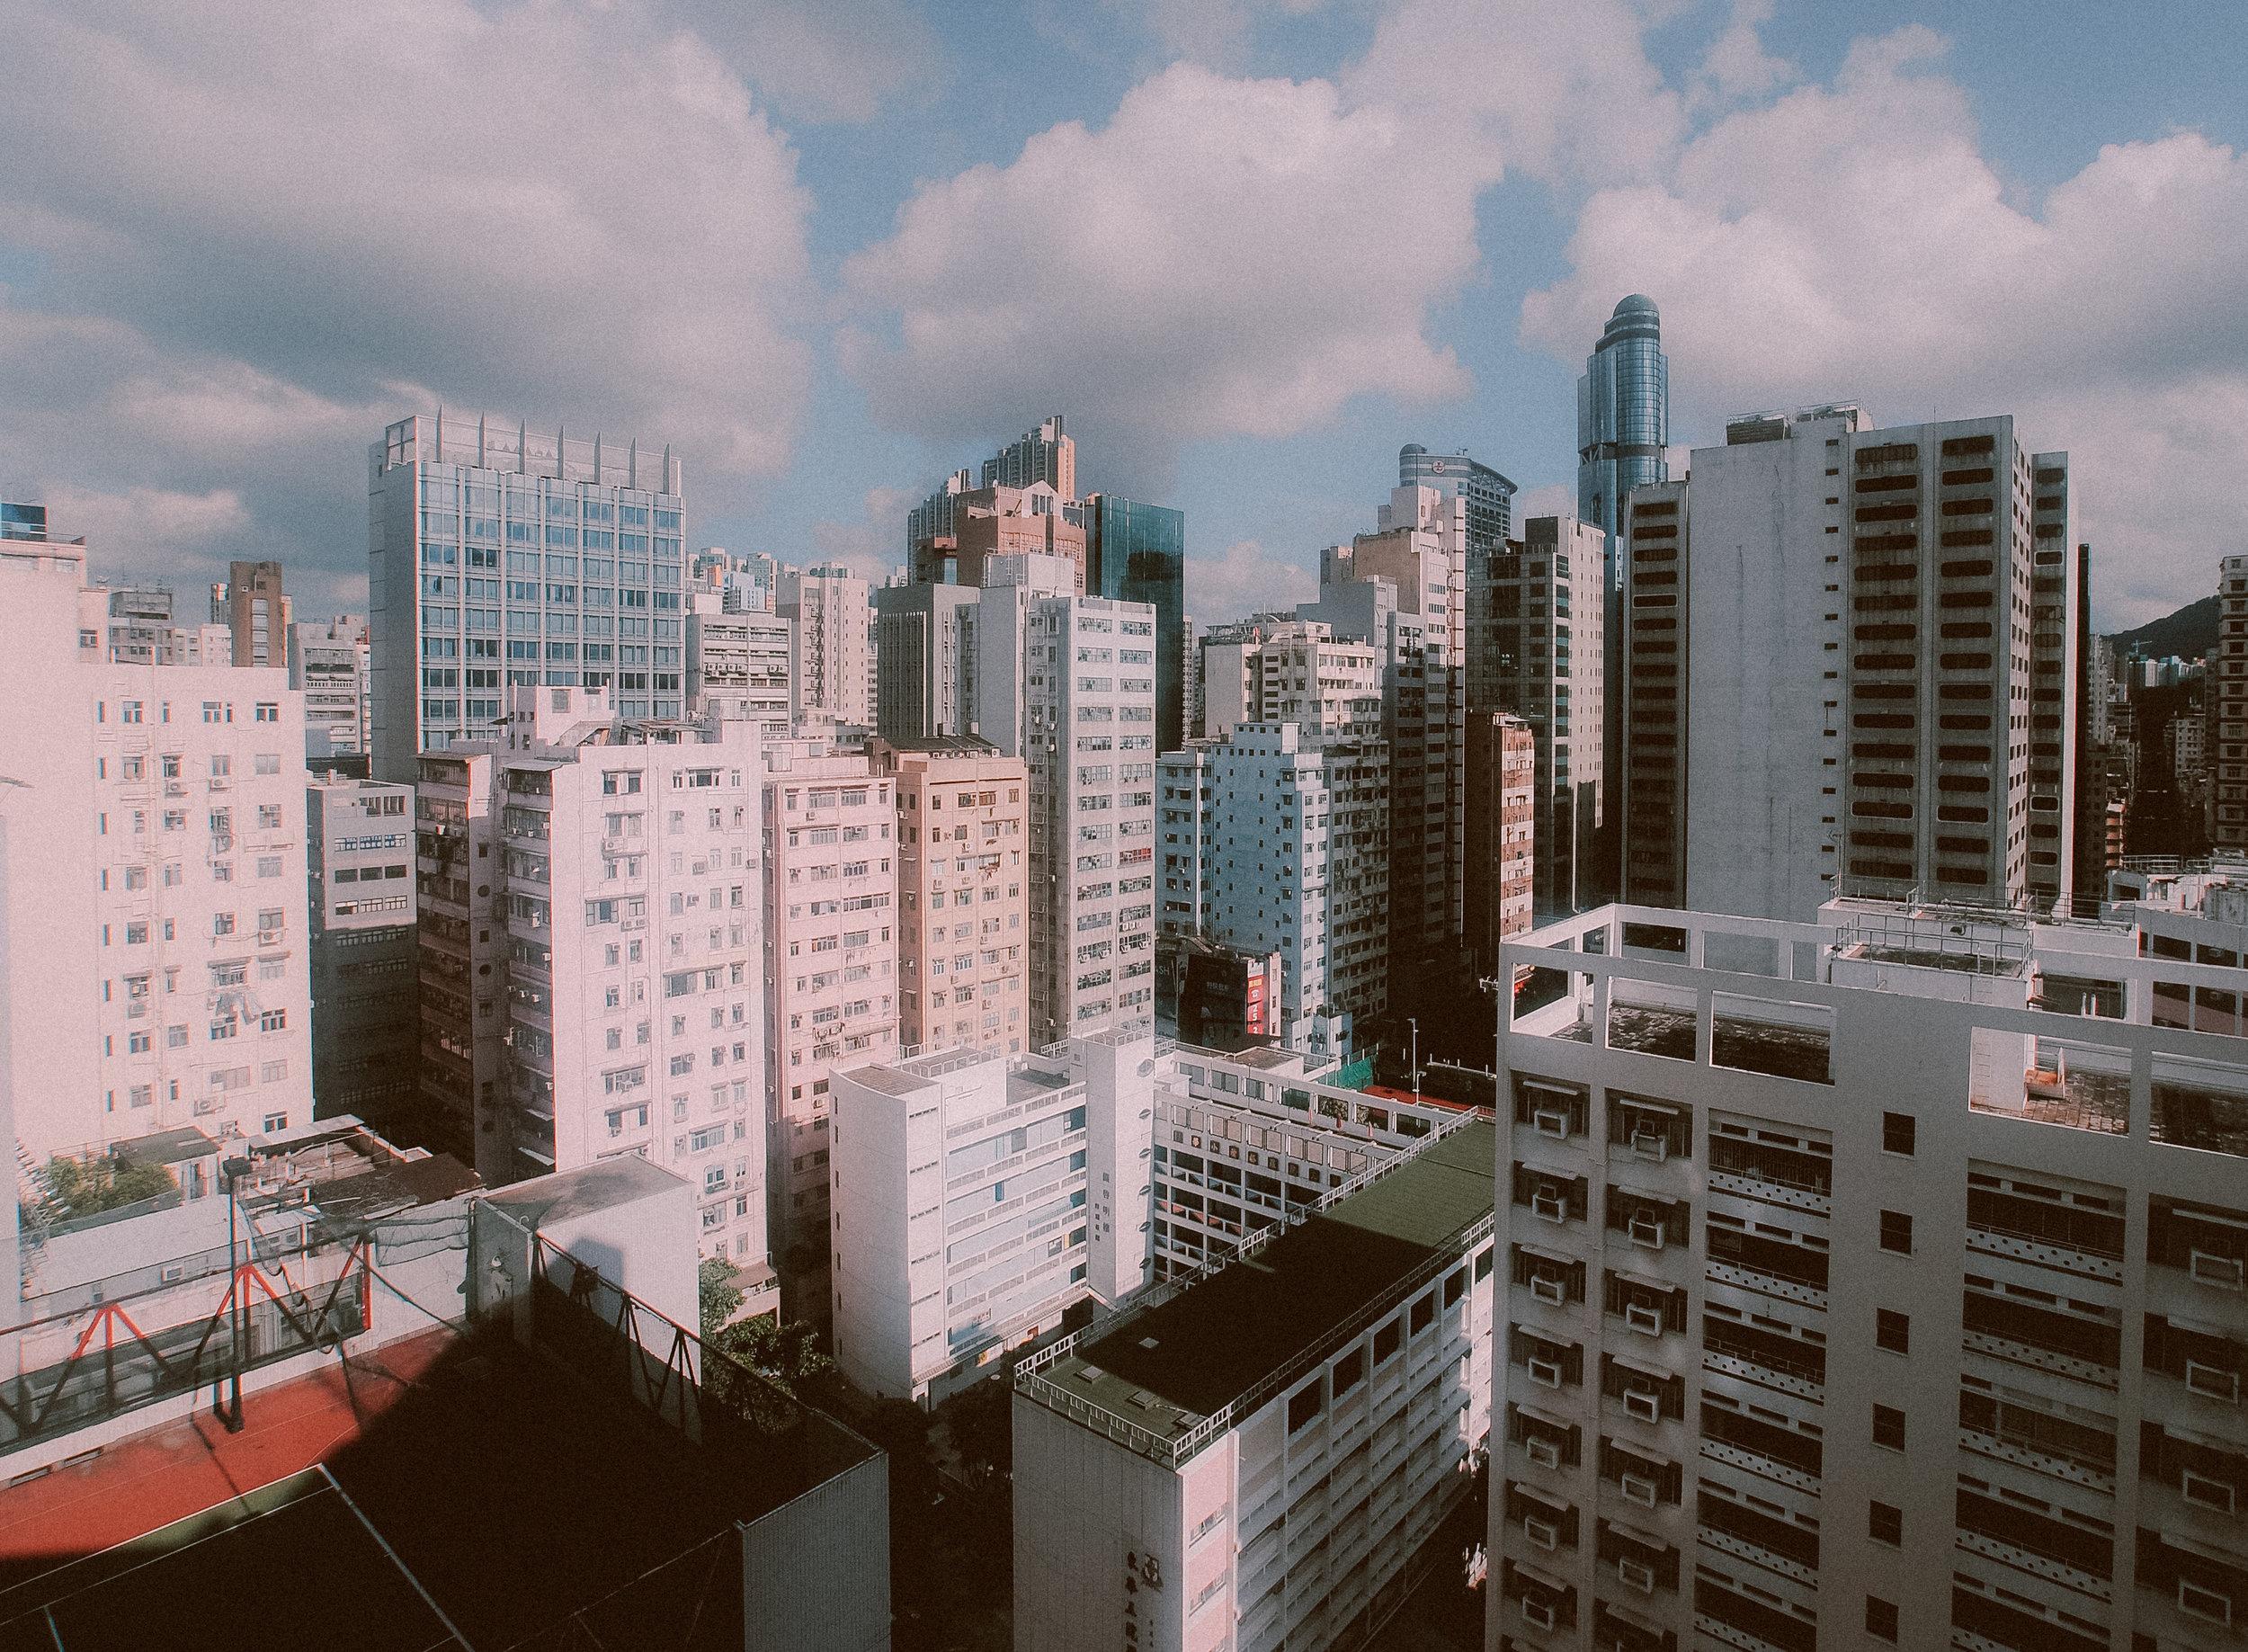 jonathan-burkhart-photographer-oklahoma-city-hongkong-china-downtown.jpg